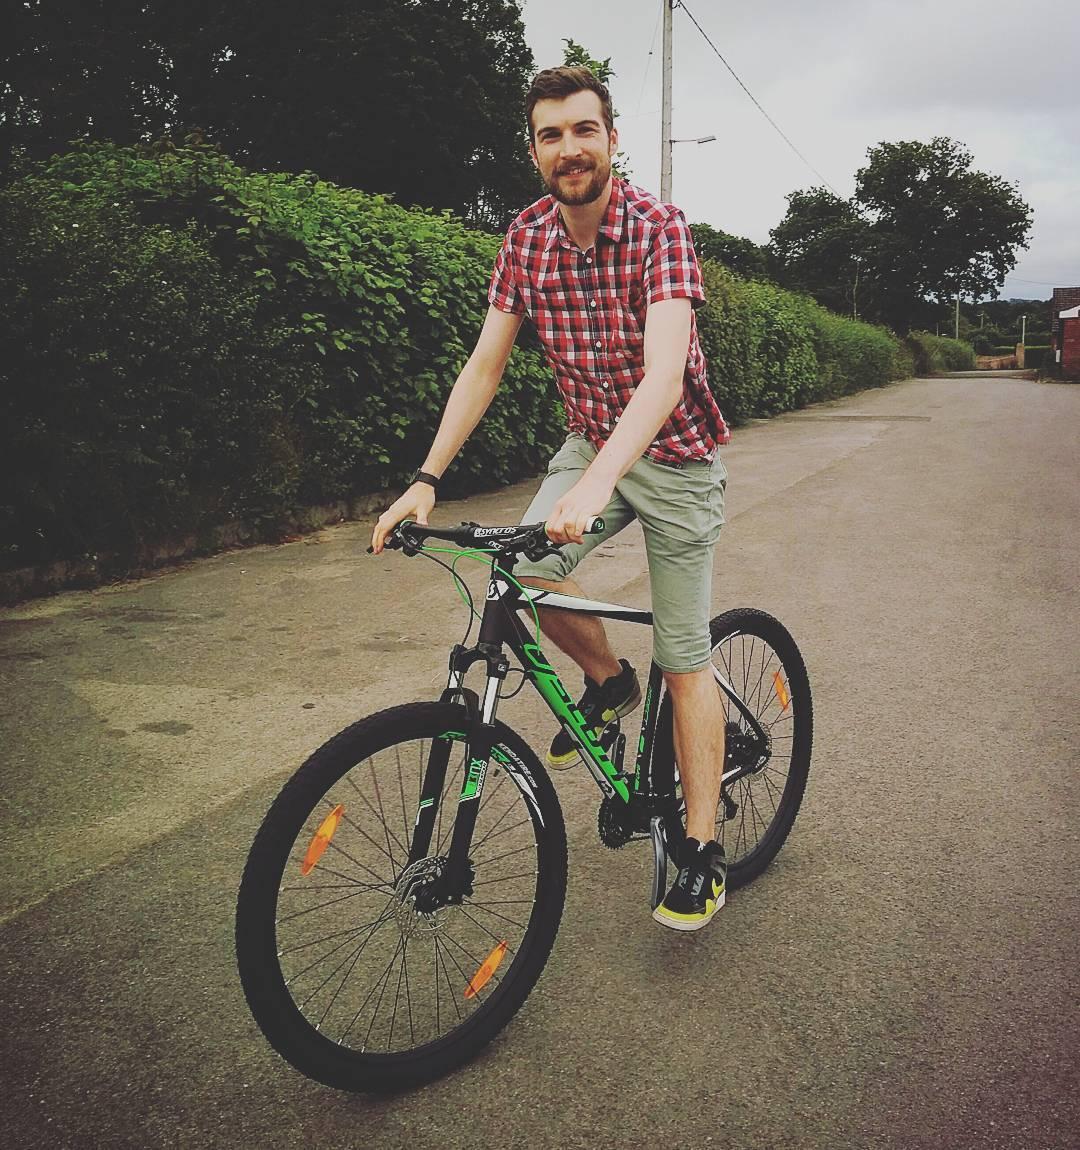 Jon on his new bike